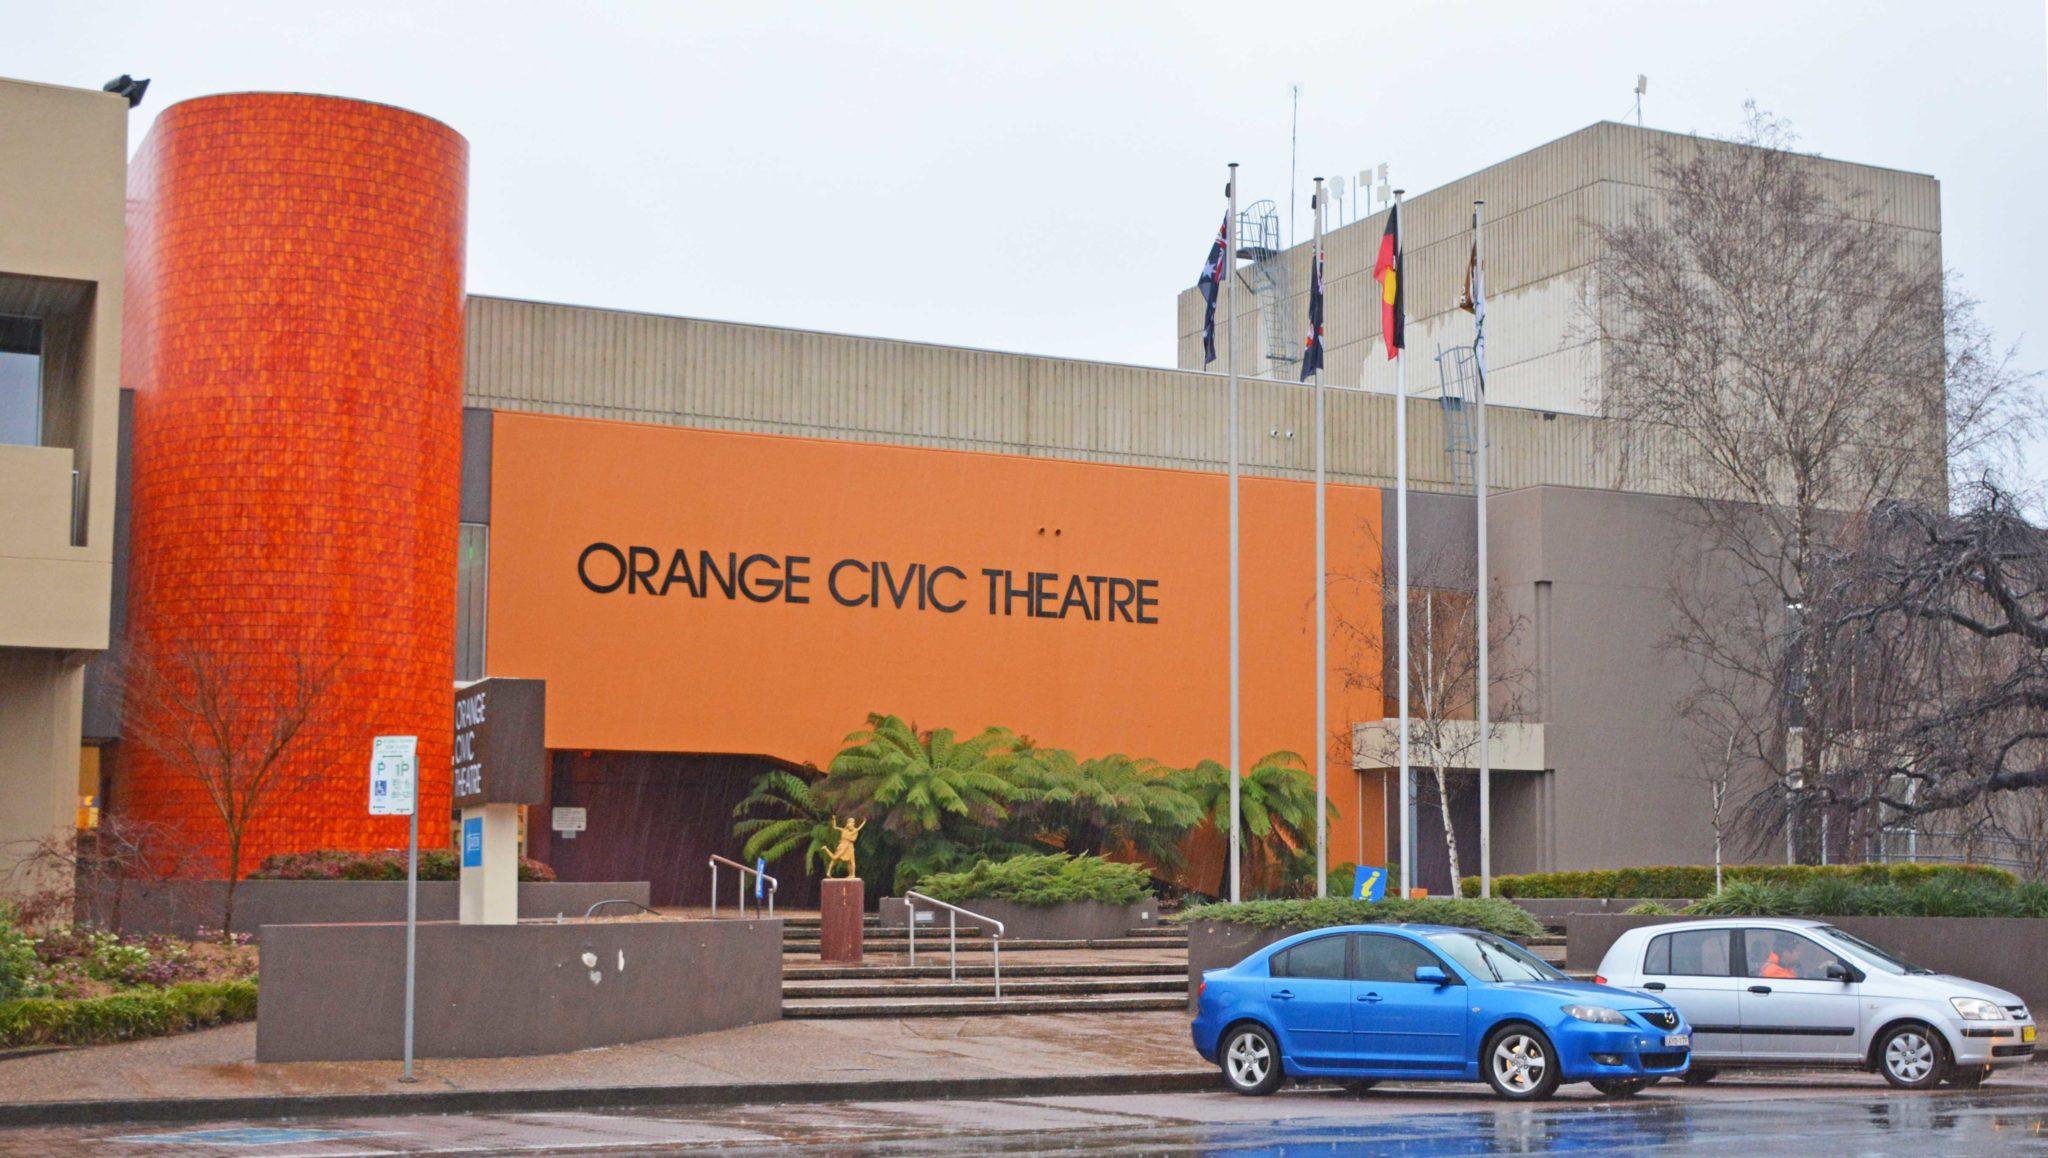 Outside view of Orange Civic Theatre